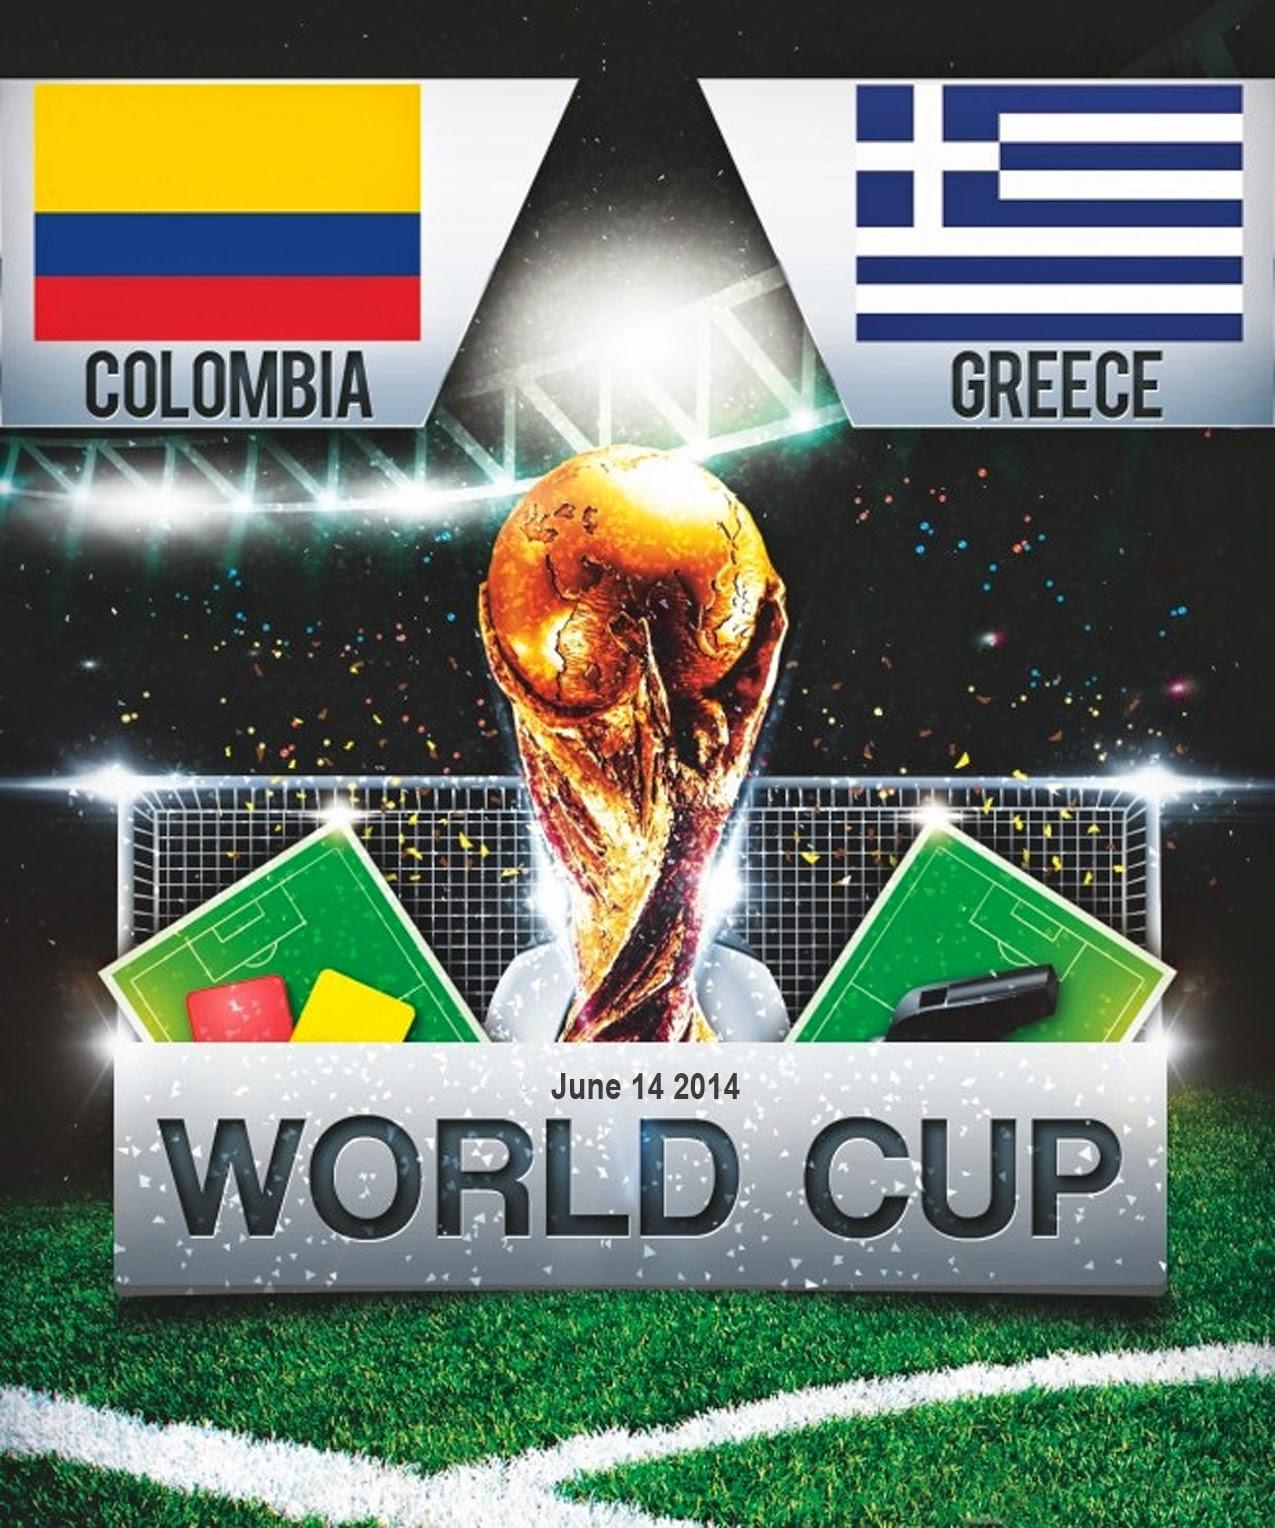 FIFA World Cup 2014 - Colombia Vs Greece